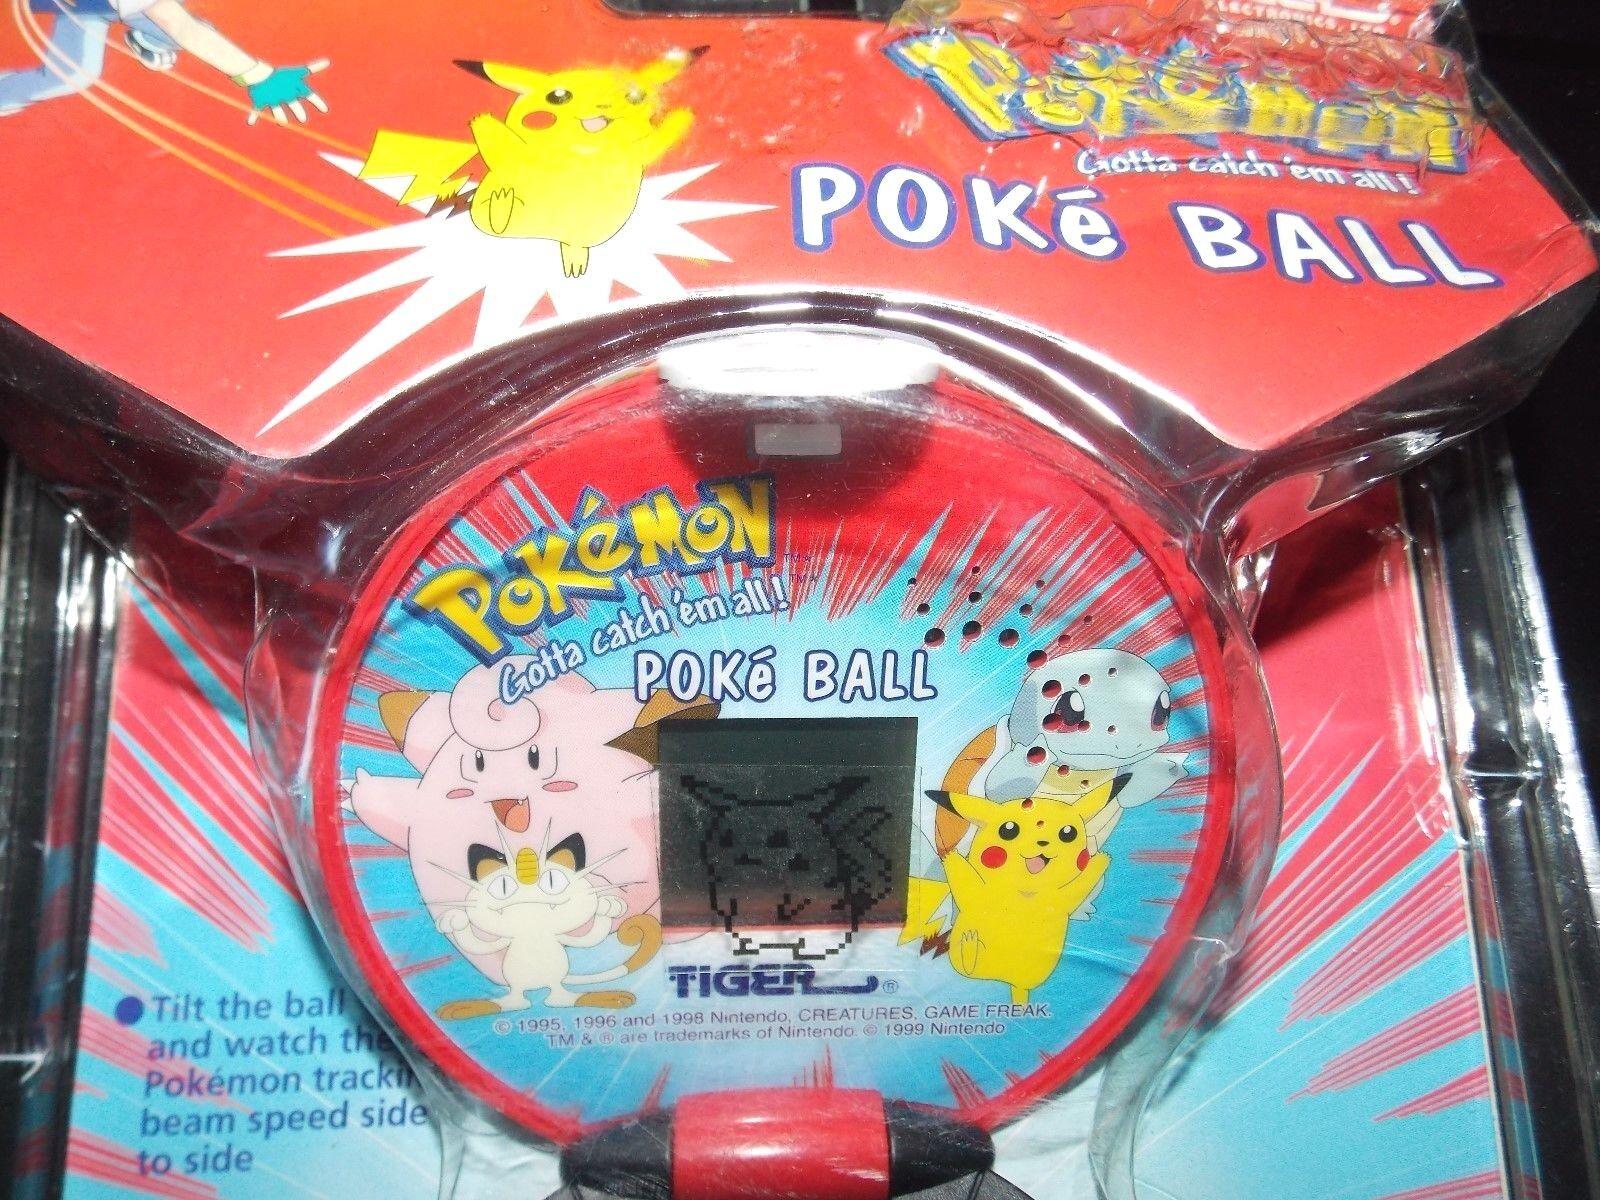 VTG 1998 Tiger Electronics Pokemon Pokeball poke ball ball ball handheld game ASH pikachu c914a2